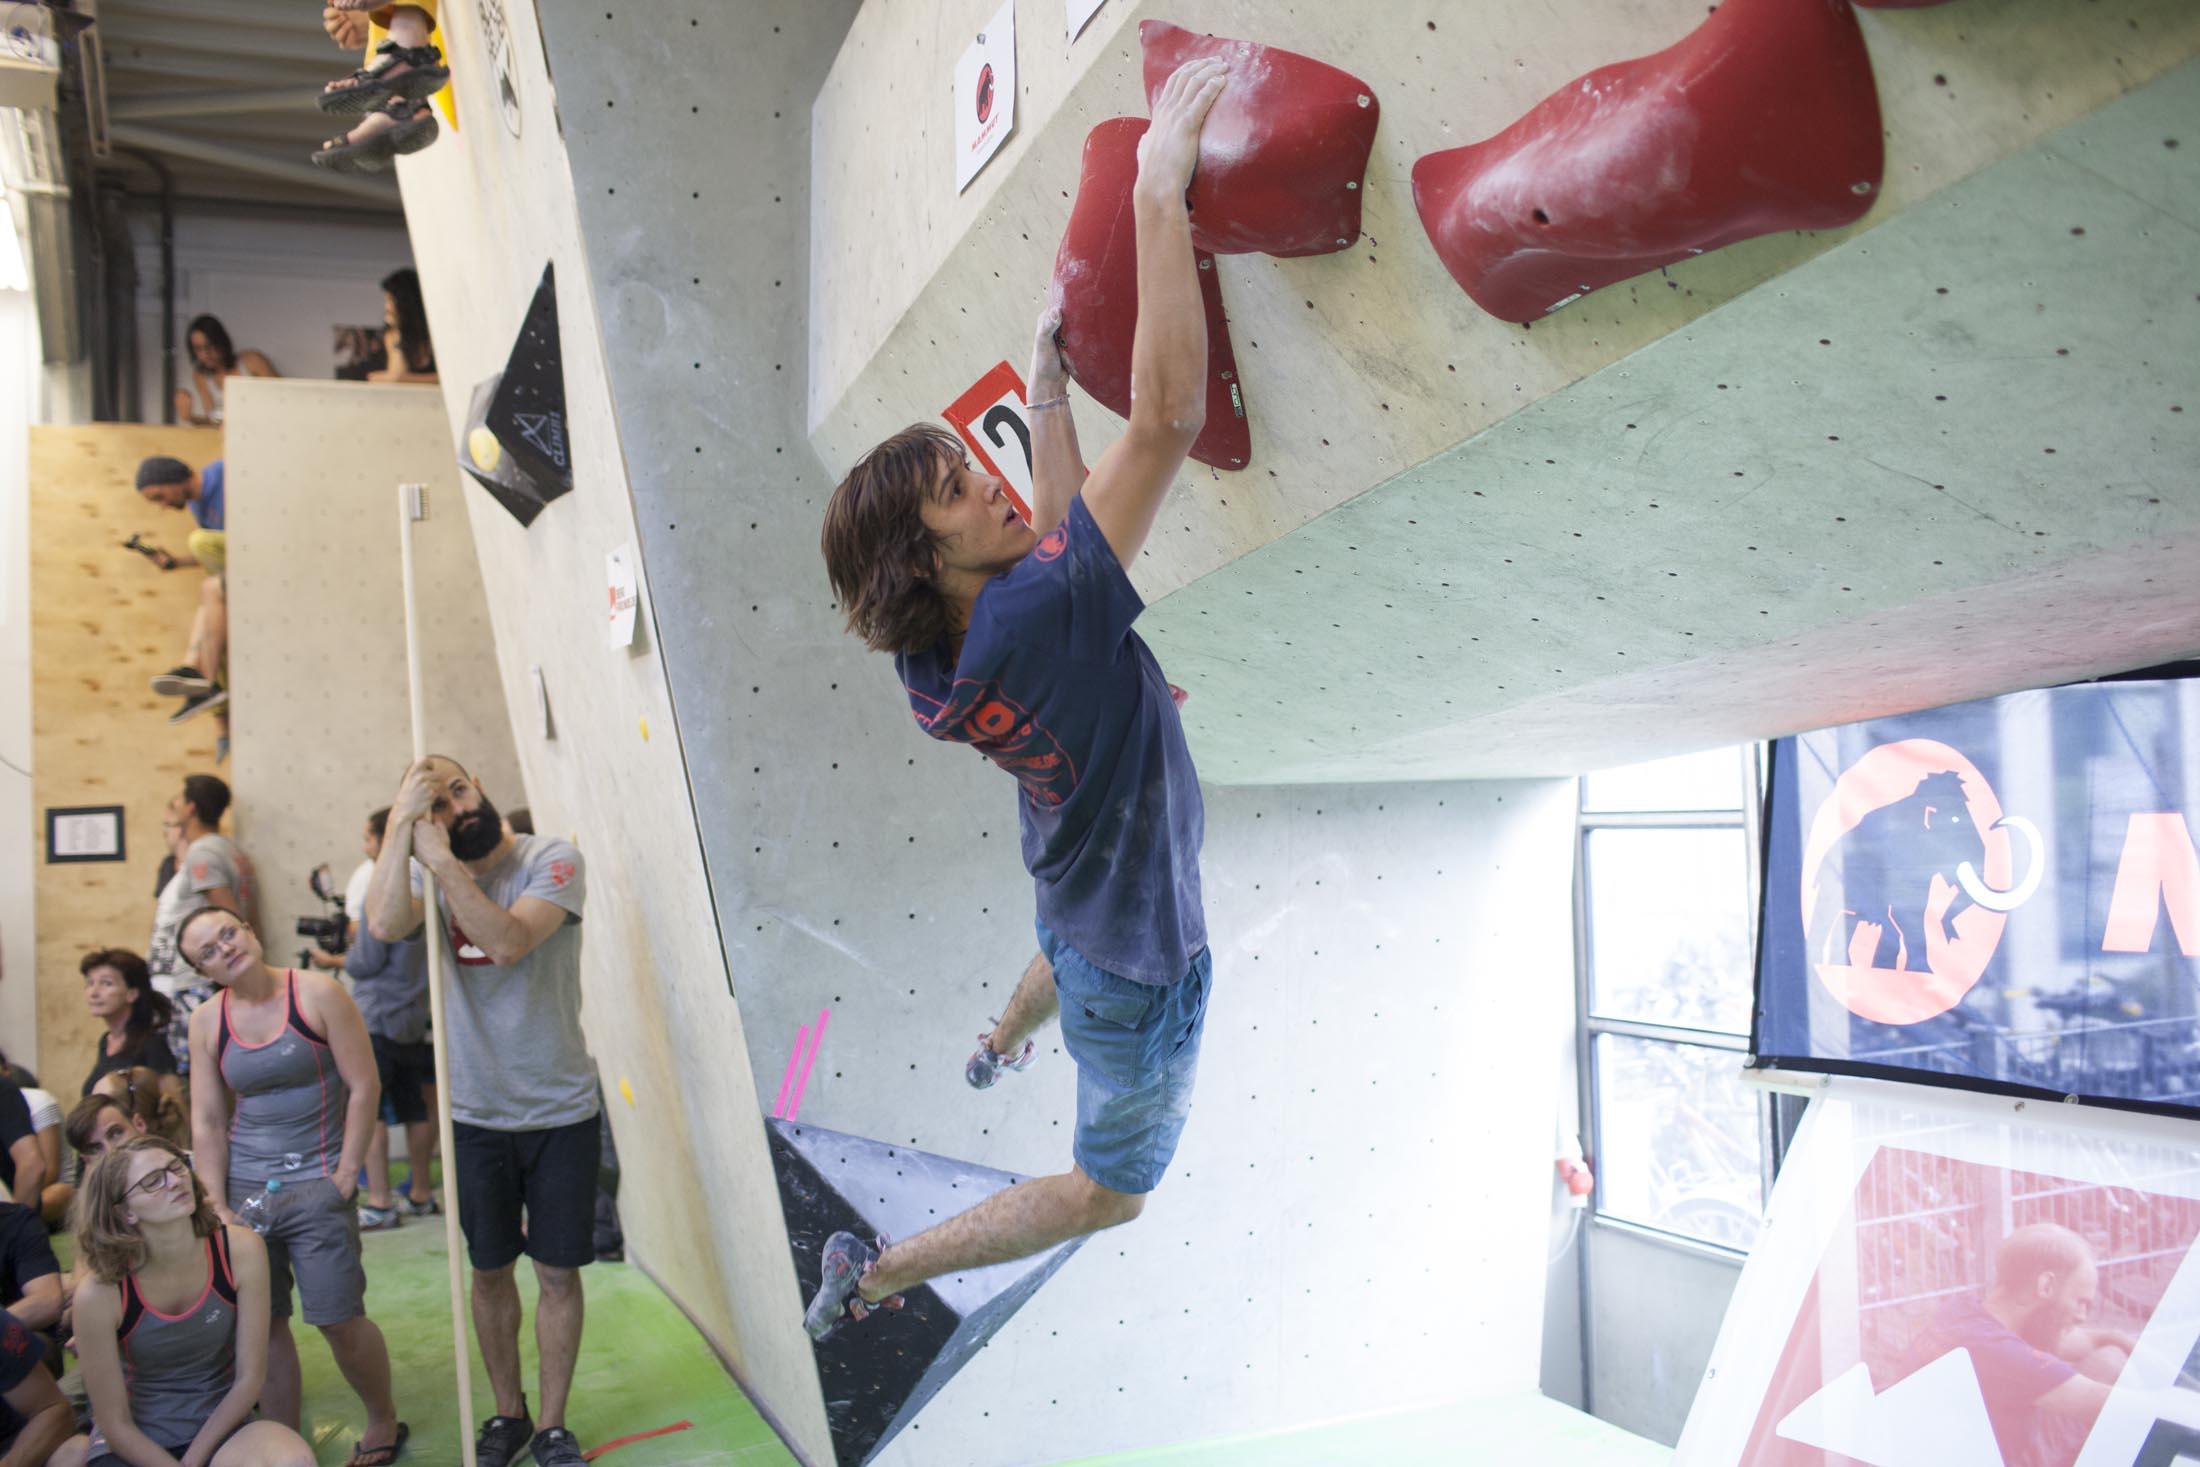 Finale, internationaler bouldercup Frankenjura 2016, BLOCKHELDEN Erlangen, Mammut, Bergfreunde.de, Boulderwettkampf07092016580